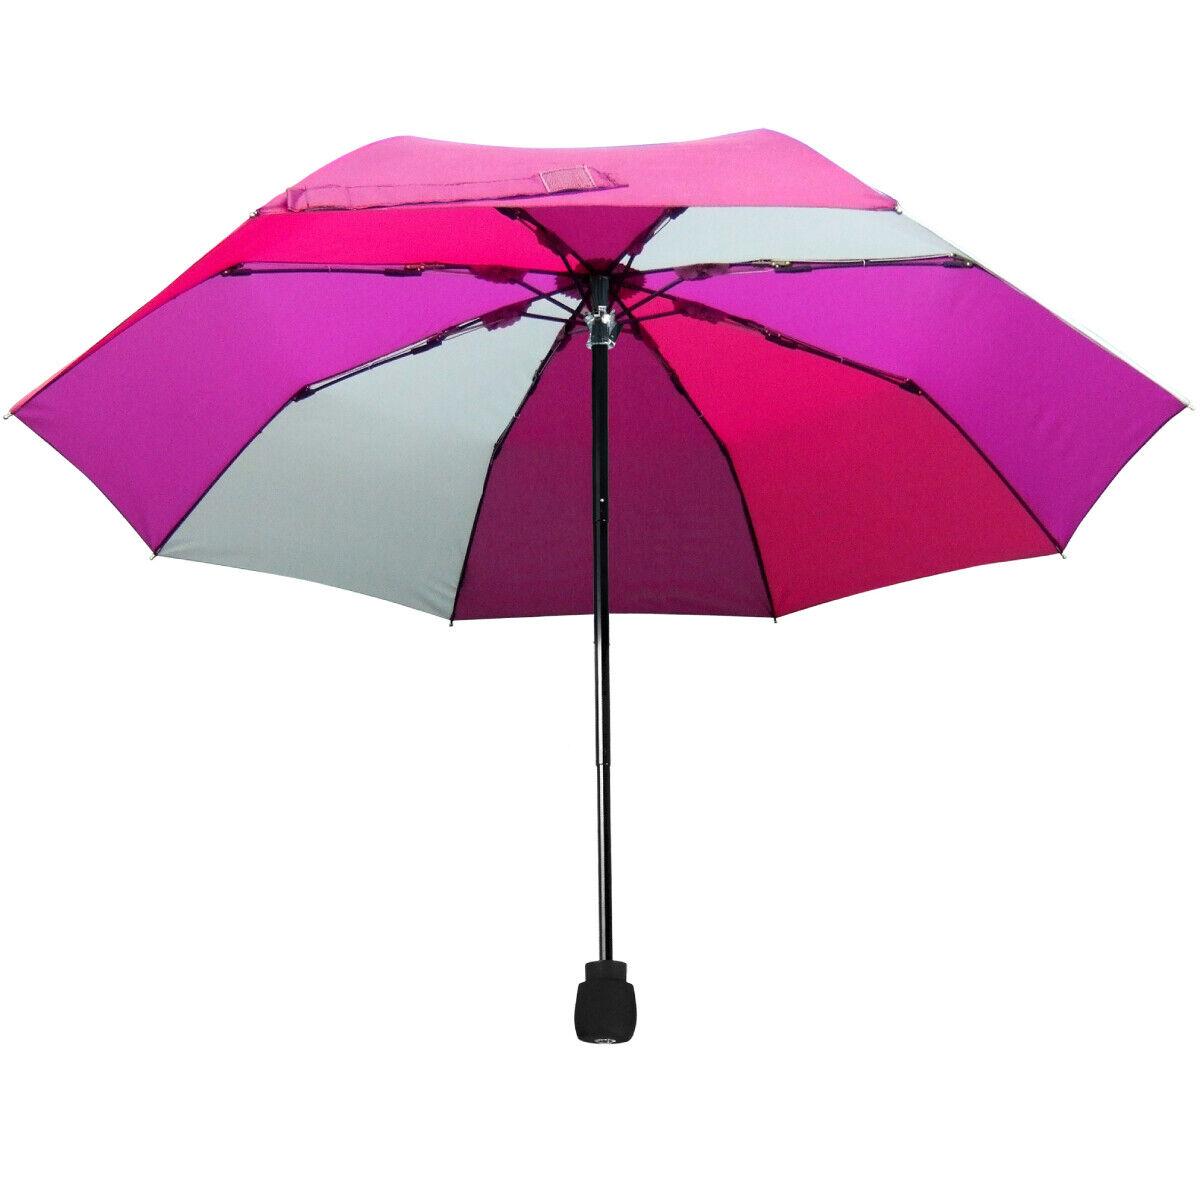 EuroSCHIRM Light Trek Umbrella (Purple Panels) Trekking Hiking Lightweight